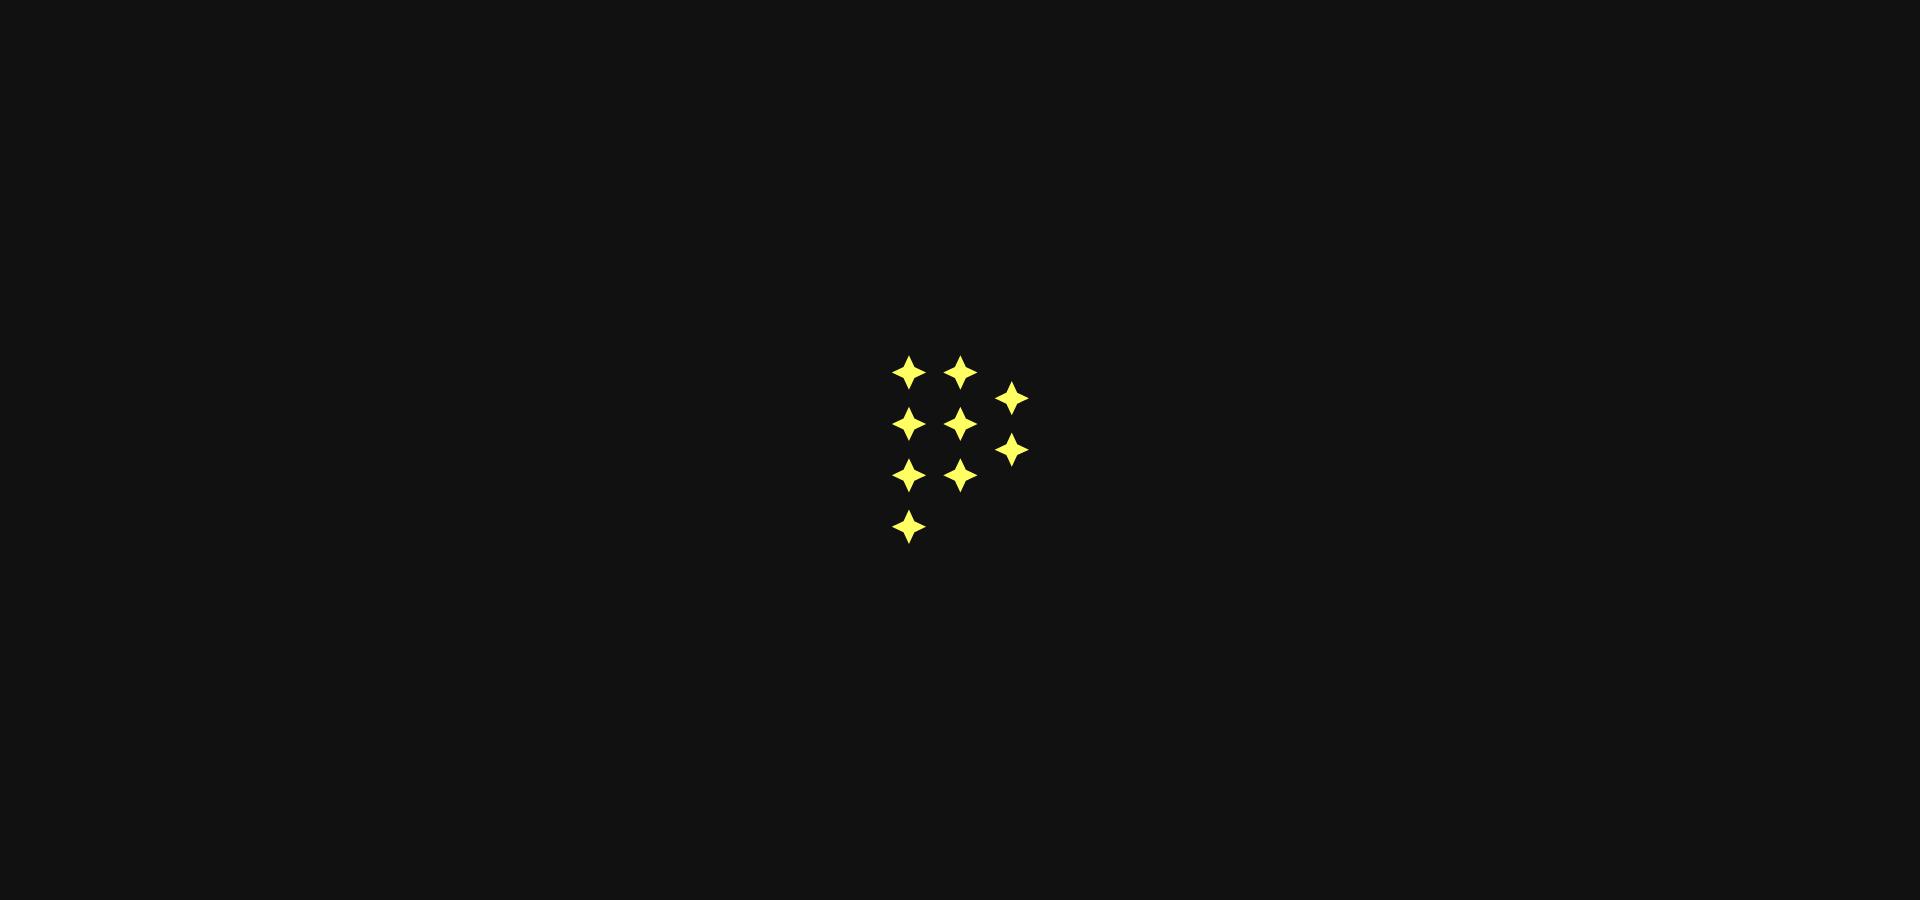 Dominik-Pacholczyk-Logo-Design-Collection-13